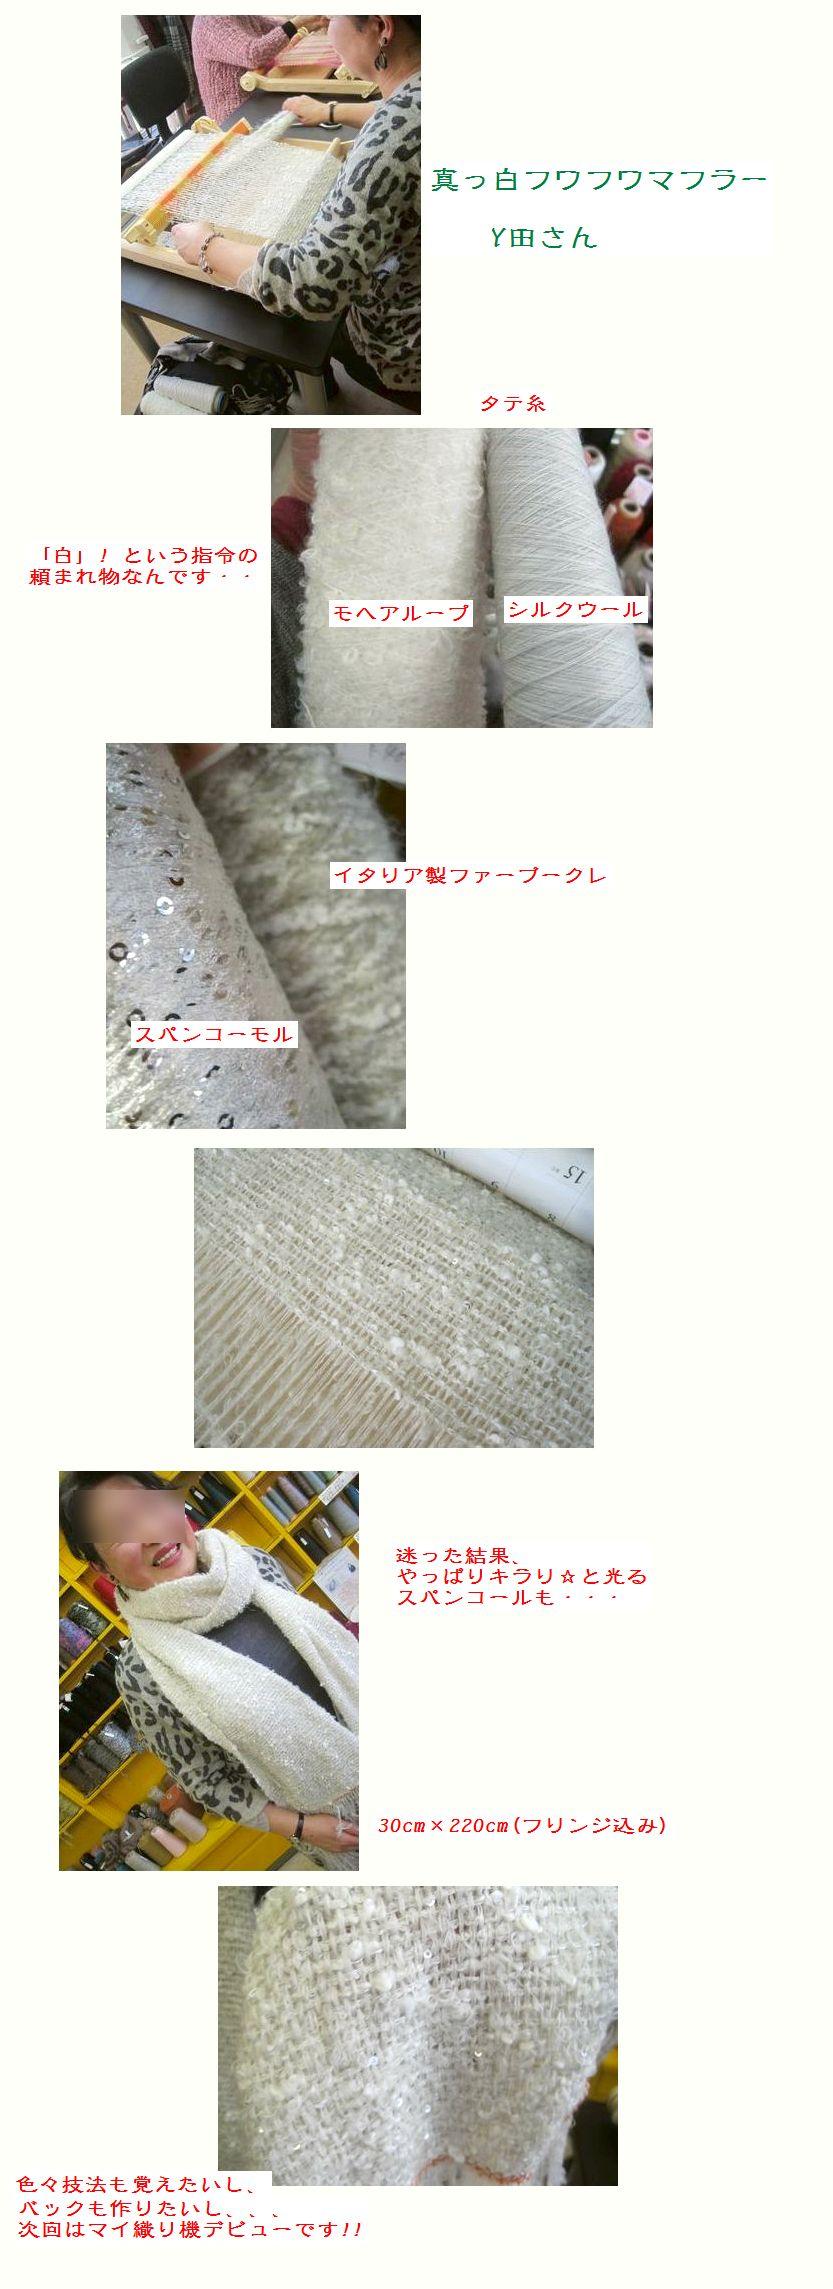 c0221884_23224399.jpg